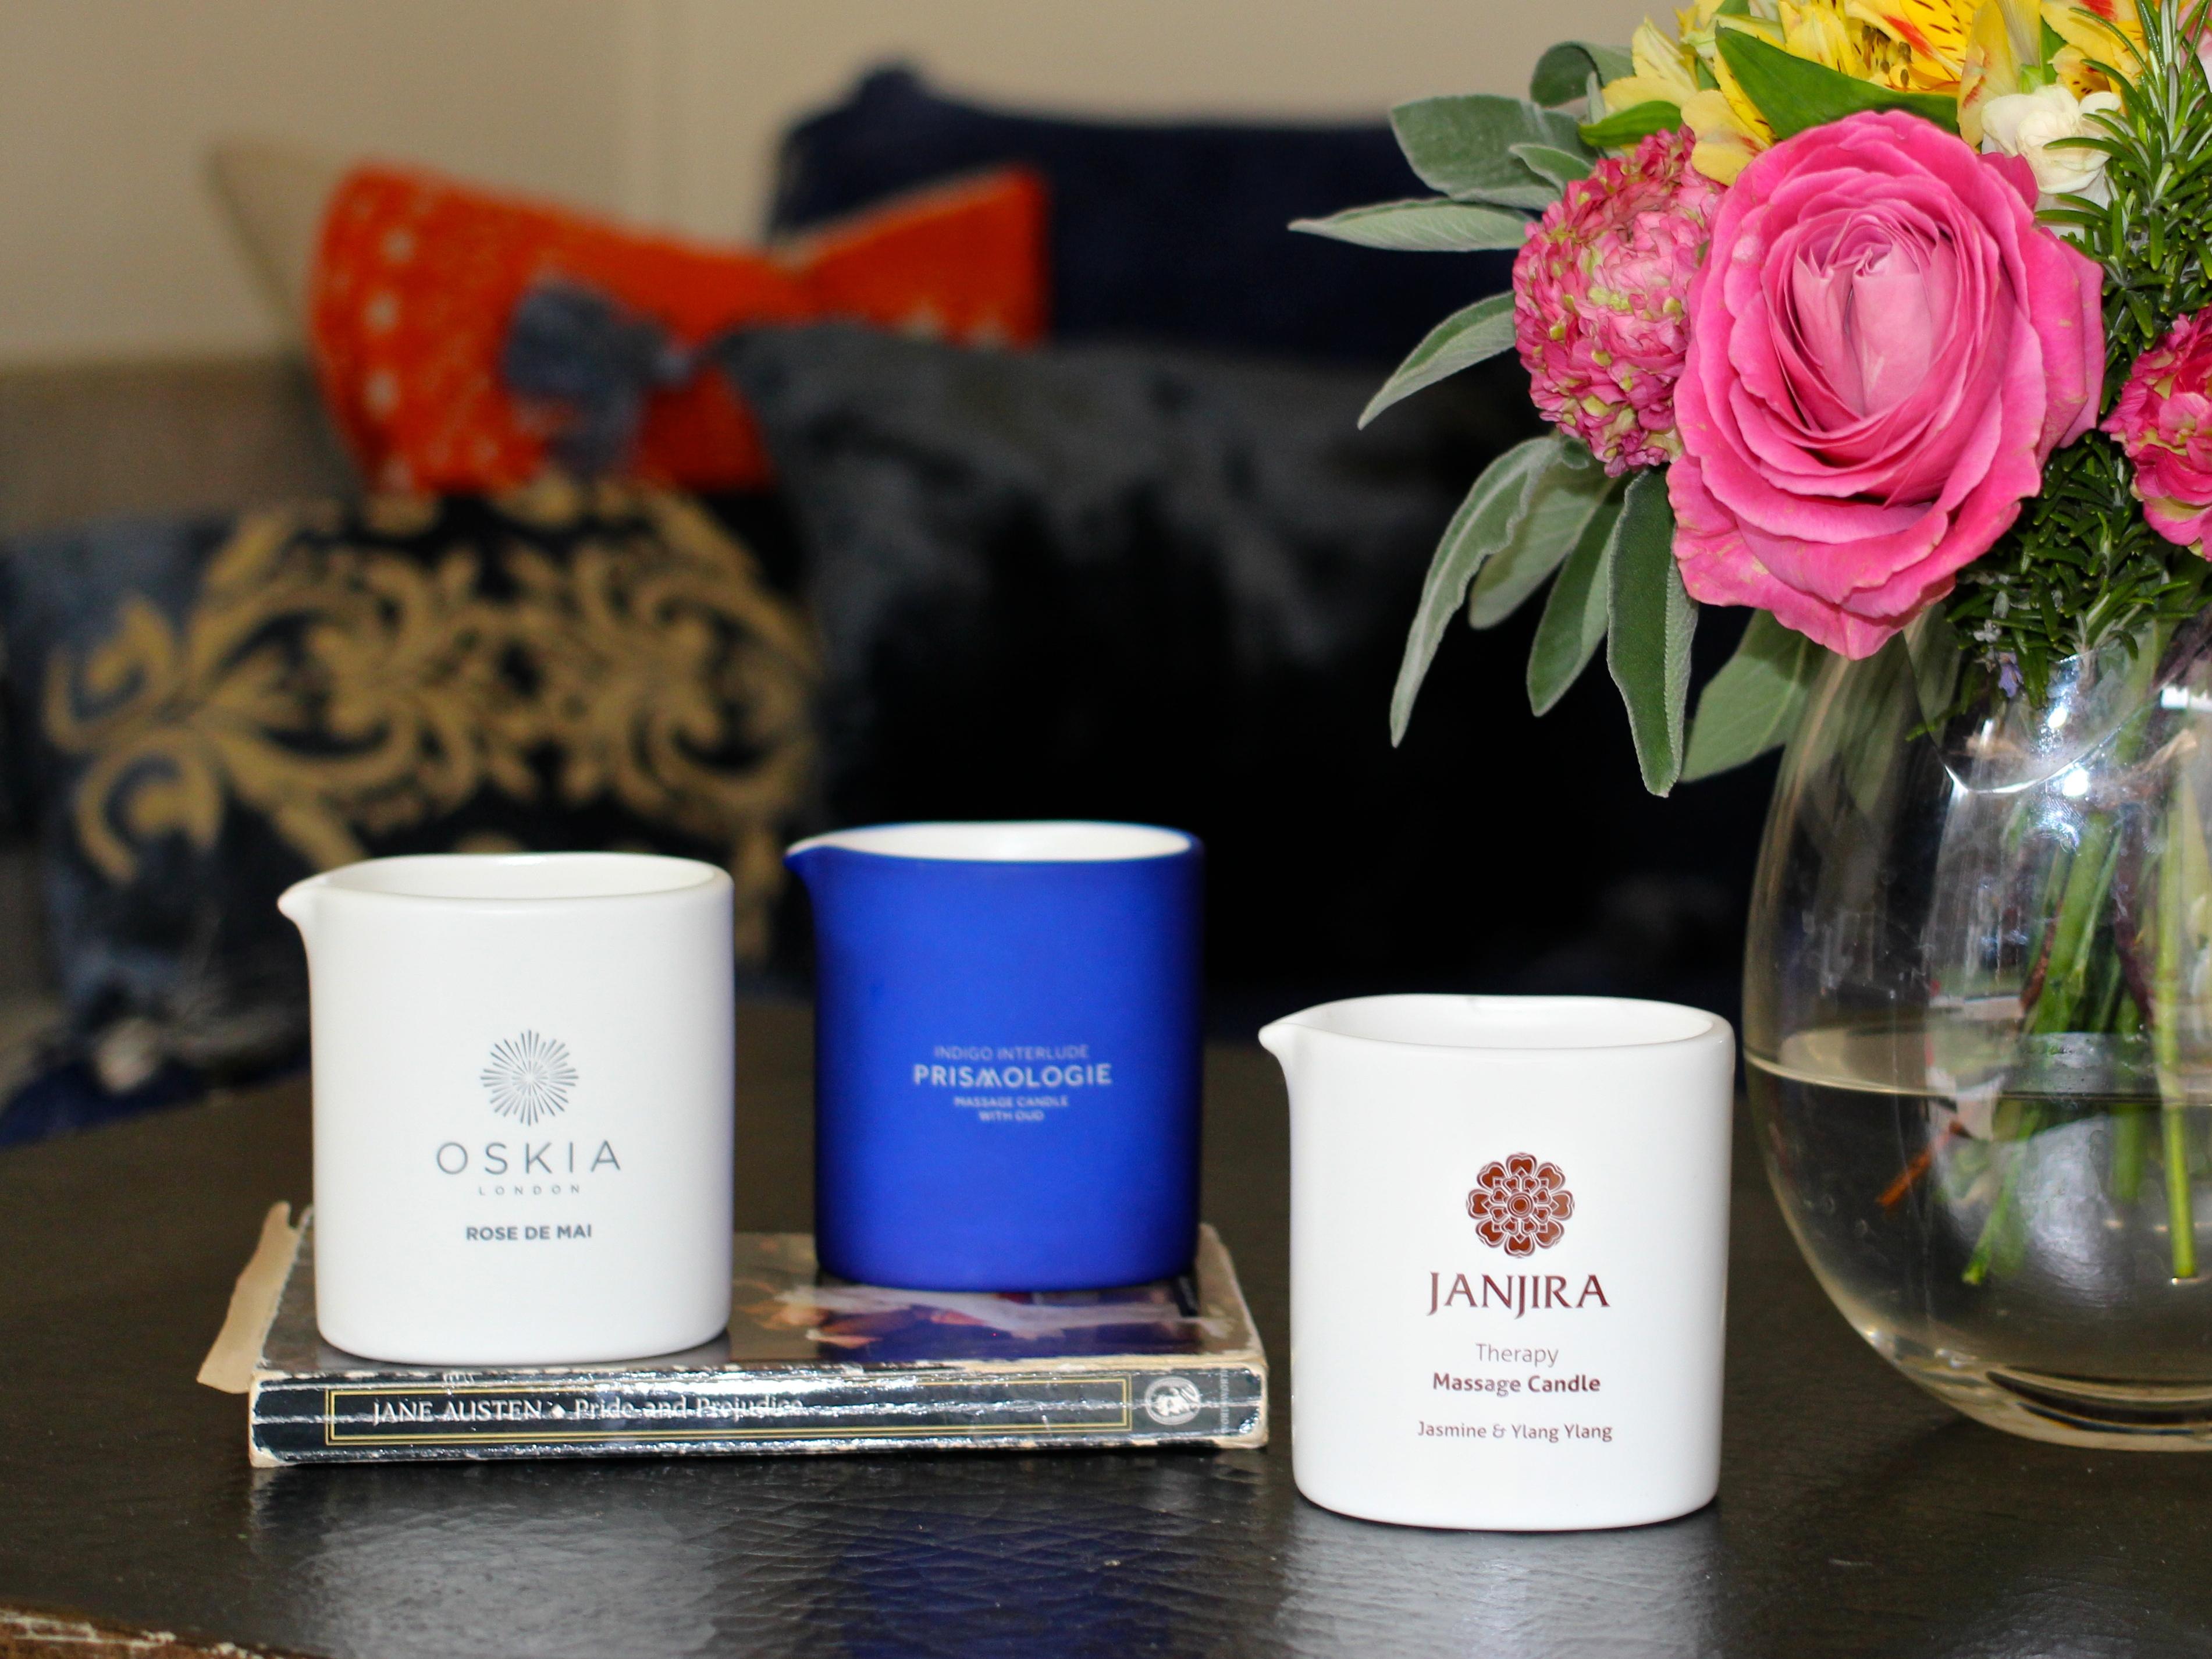 Prismologie, Janjira and Oskia Massage Candle Reviews